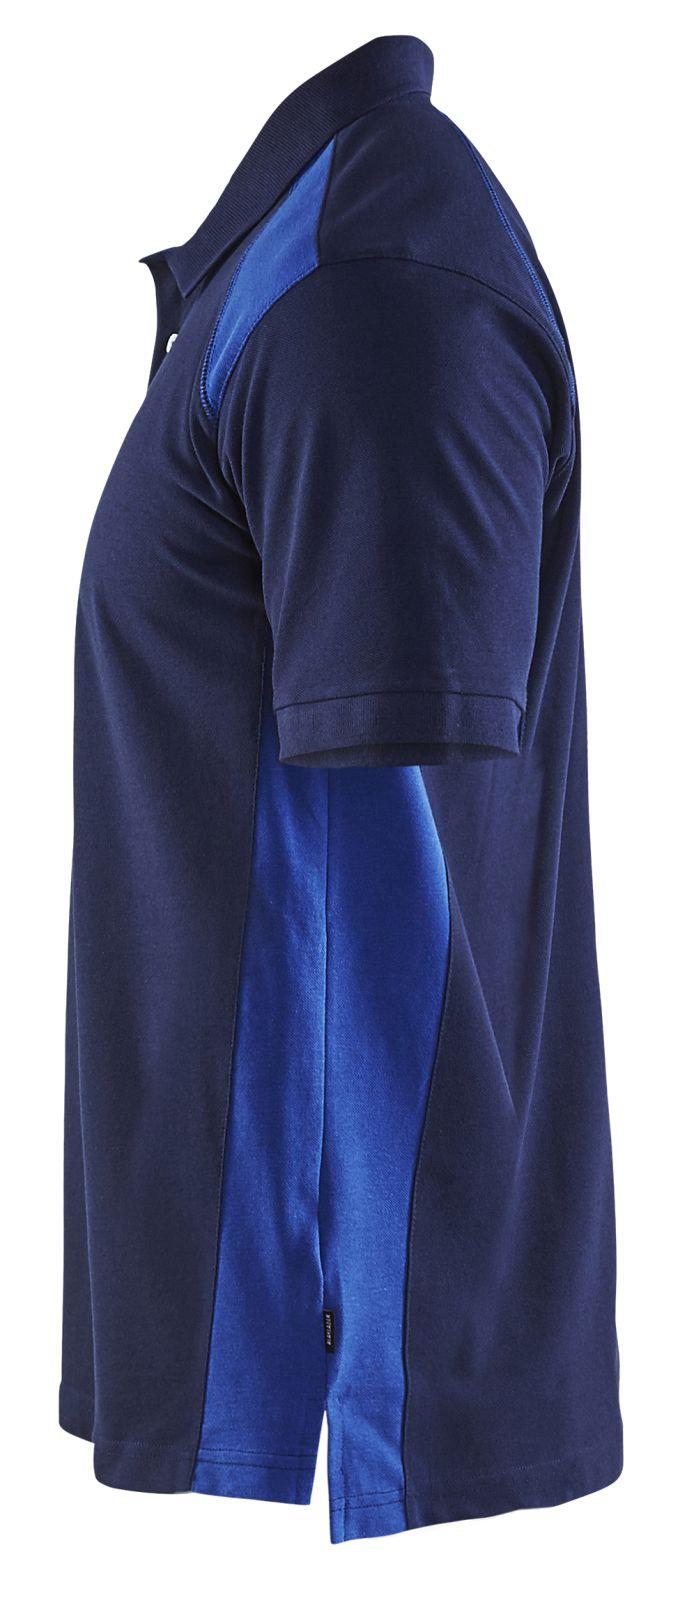 Blaklader Polo shirts 33241050 marineblauw-korenblauw(8985)